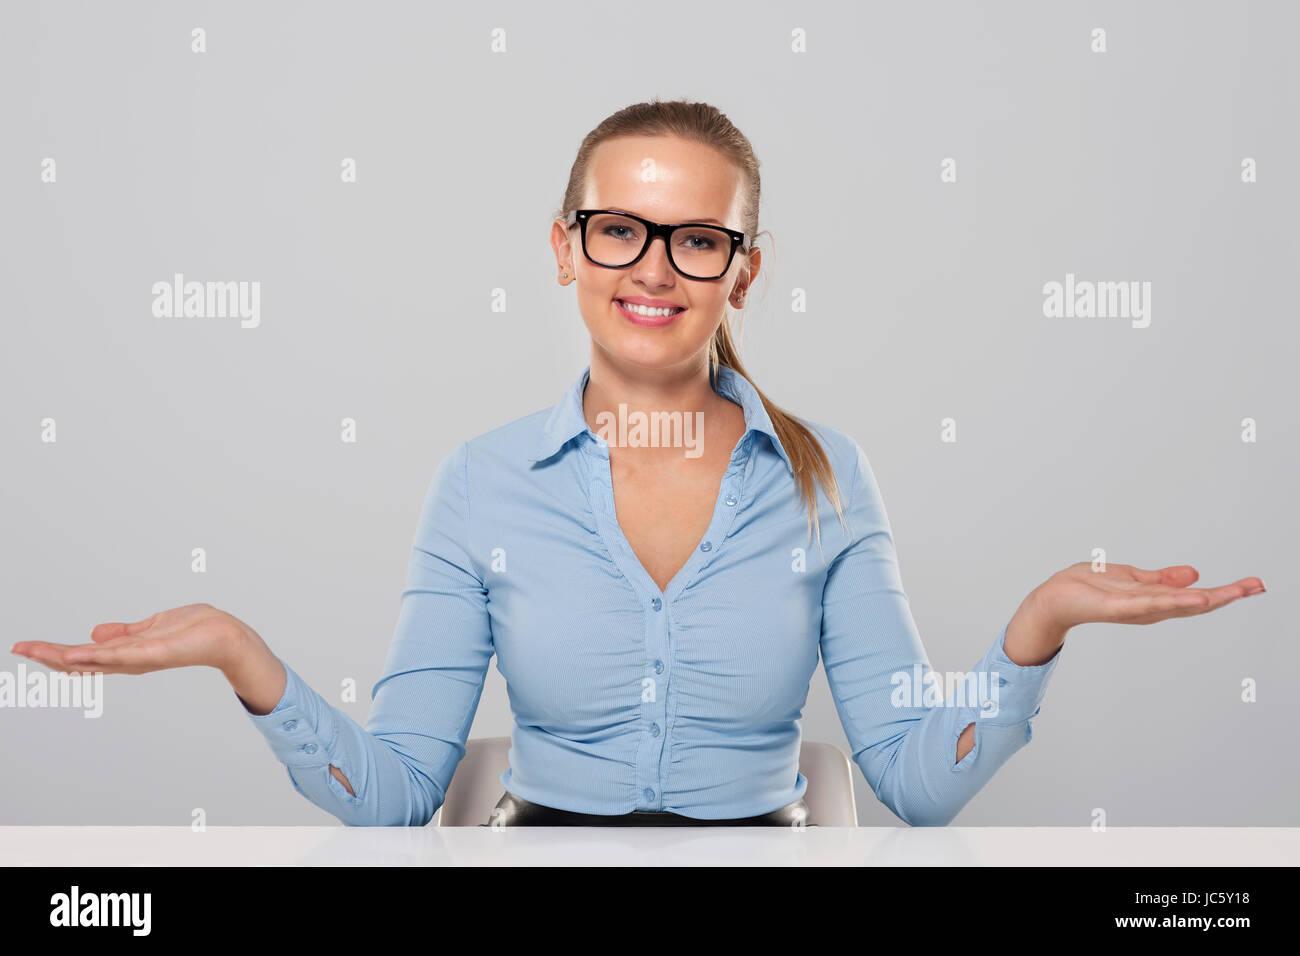 Confident businesswoman welcome gesture Stock Photo